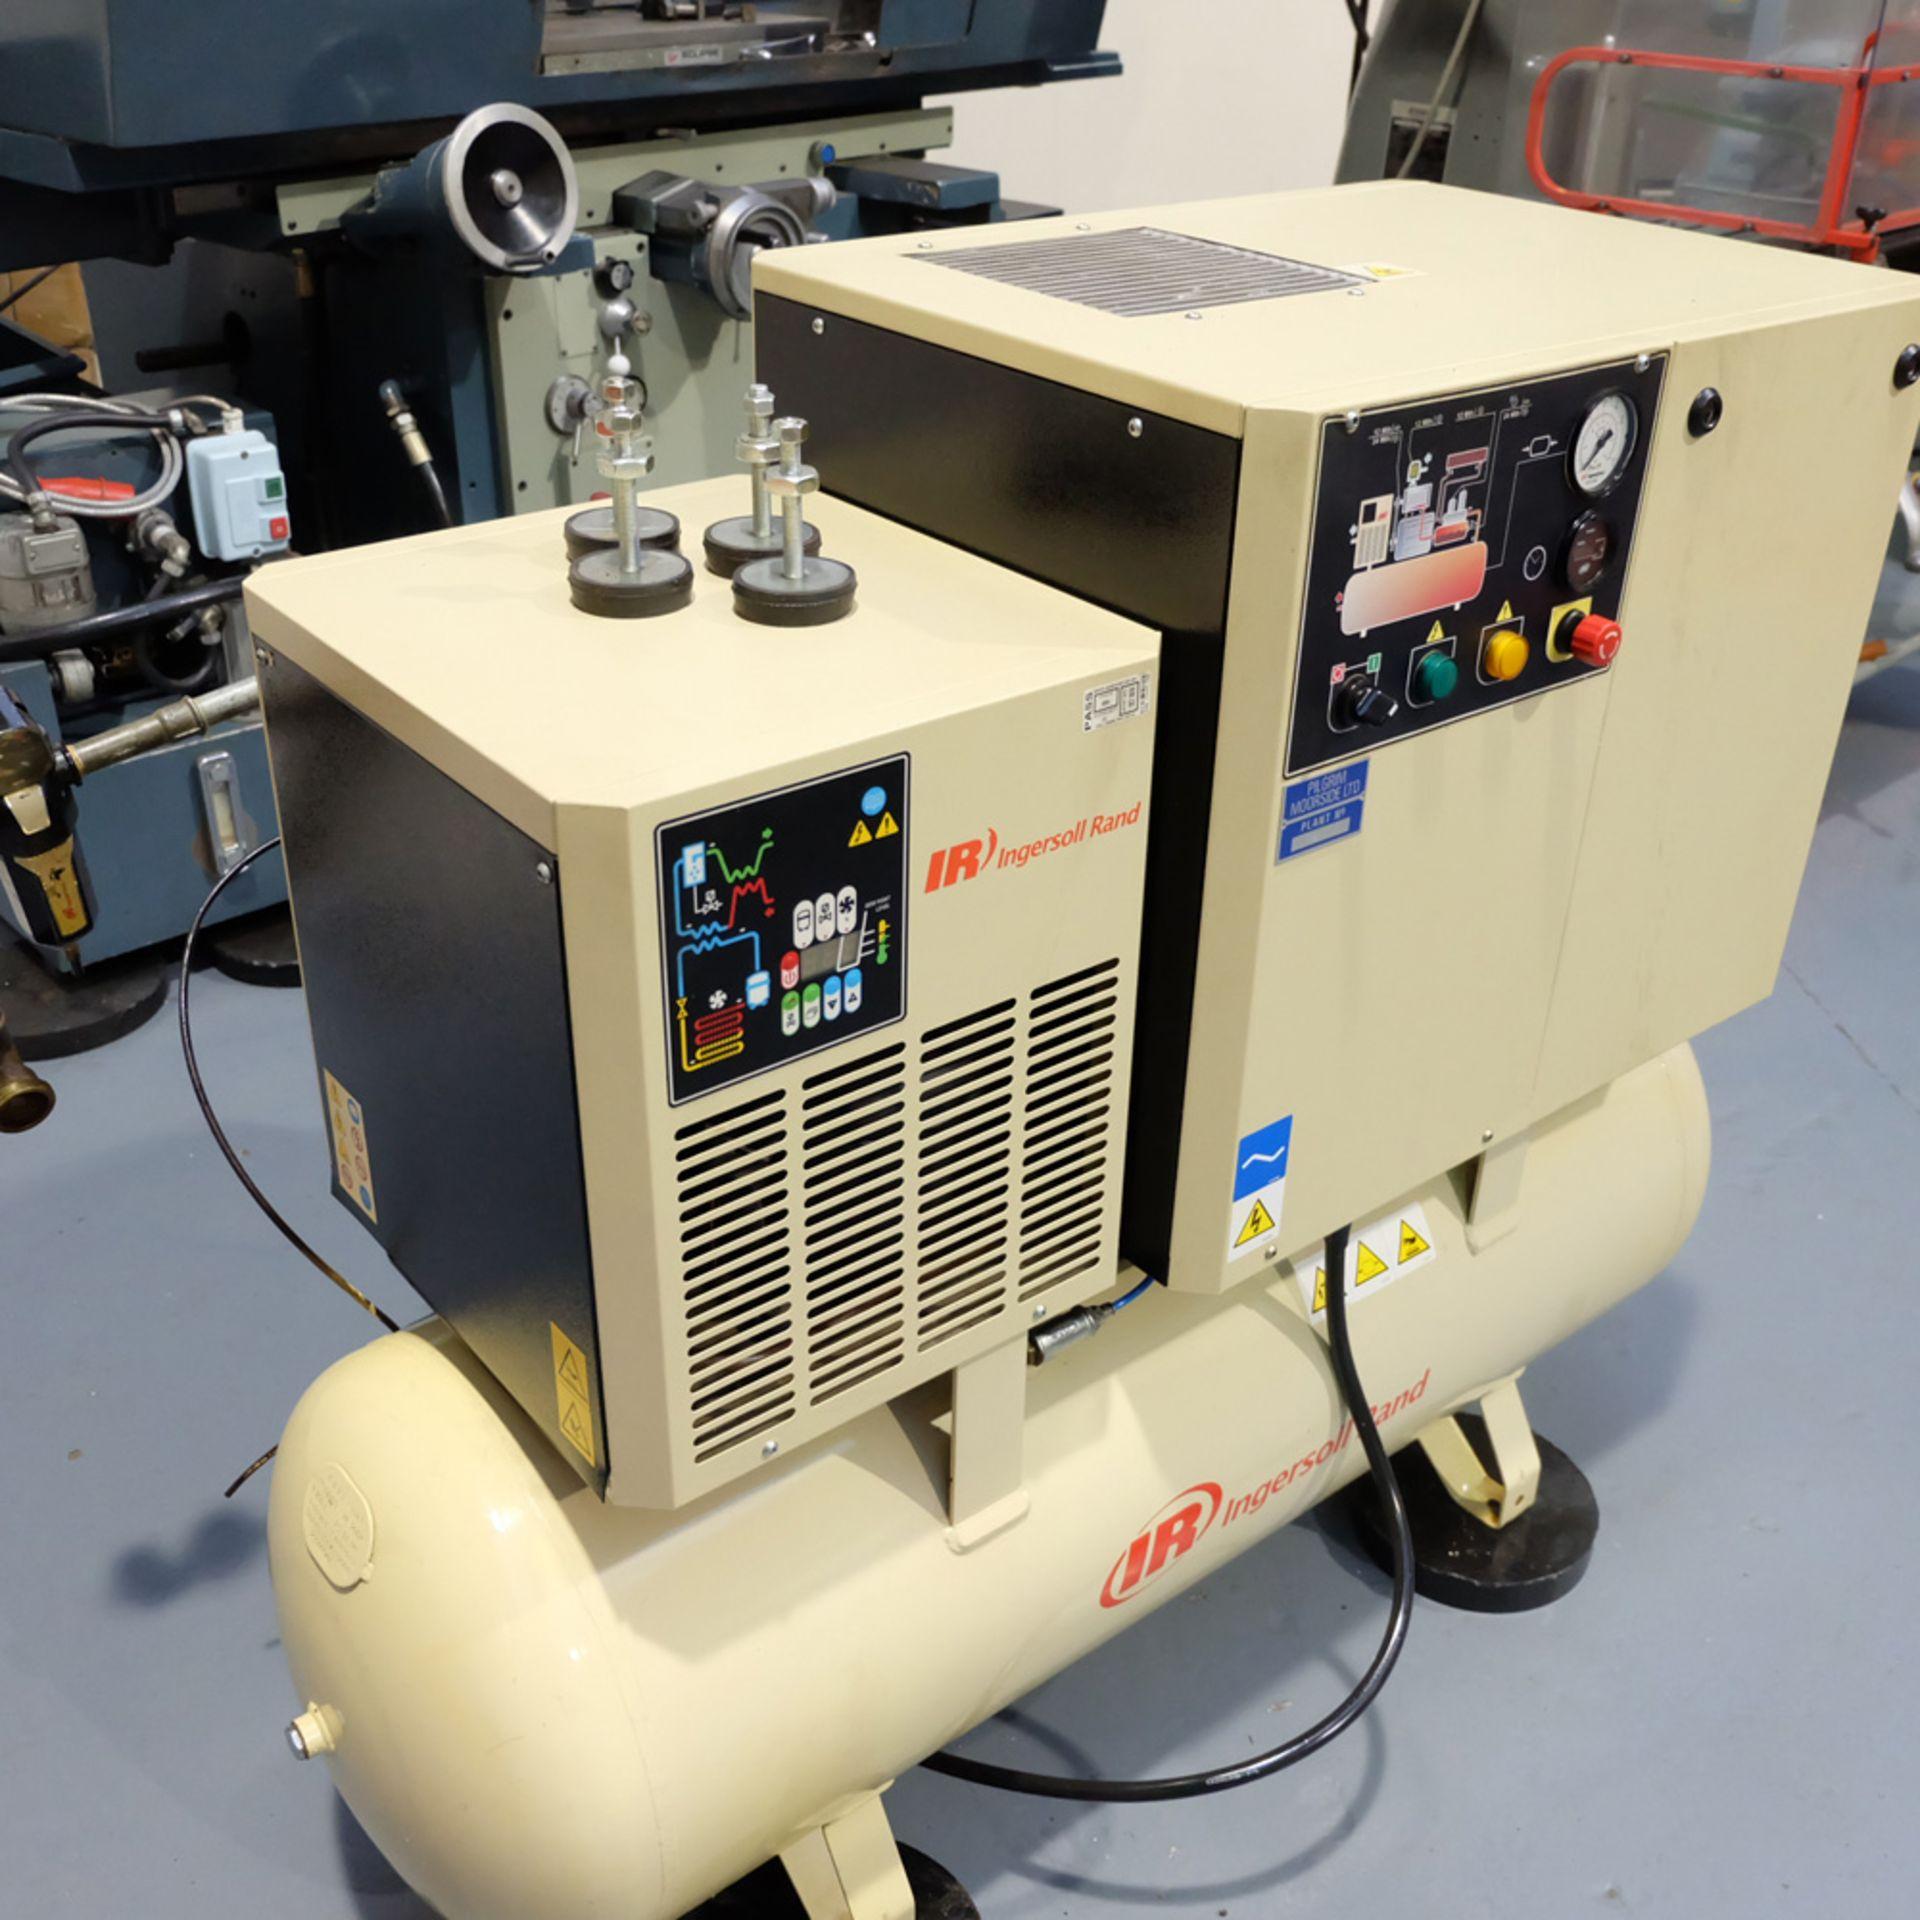 Ingersoll Rand Model R5.5IU D-SD Rotary Air Compressor. Working Pressure 10 Bar. - Image 2 of 9